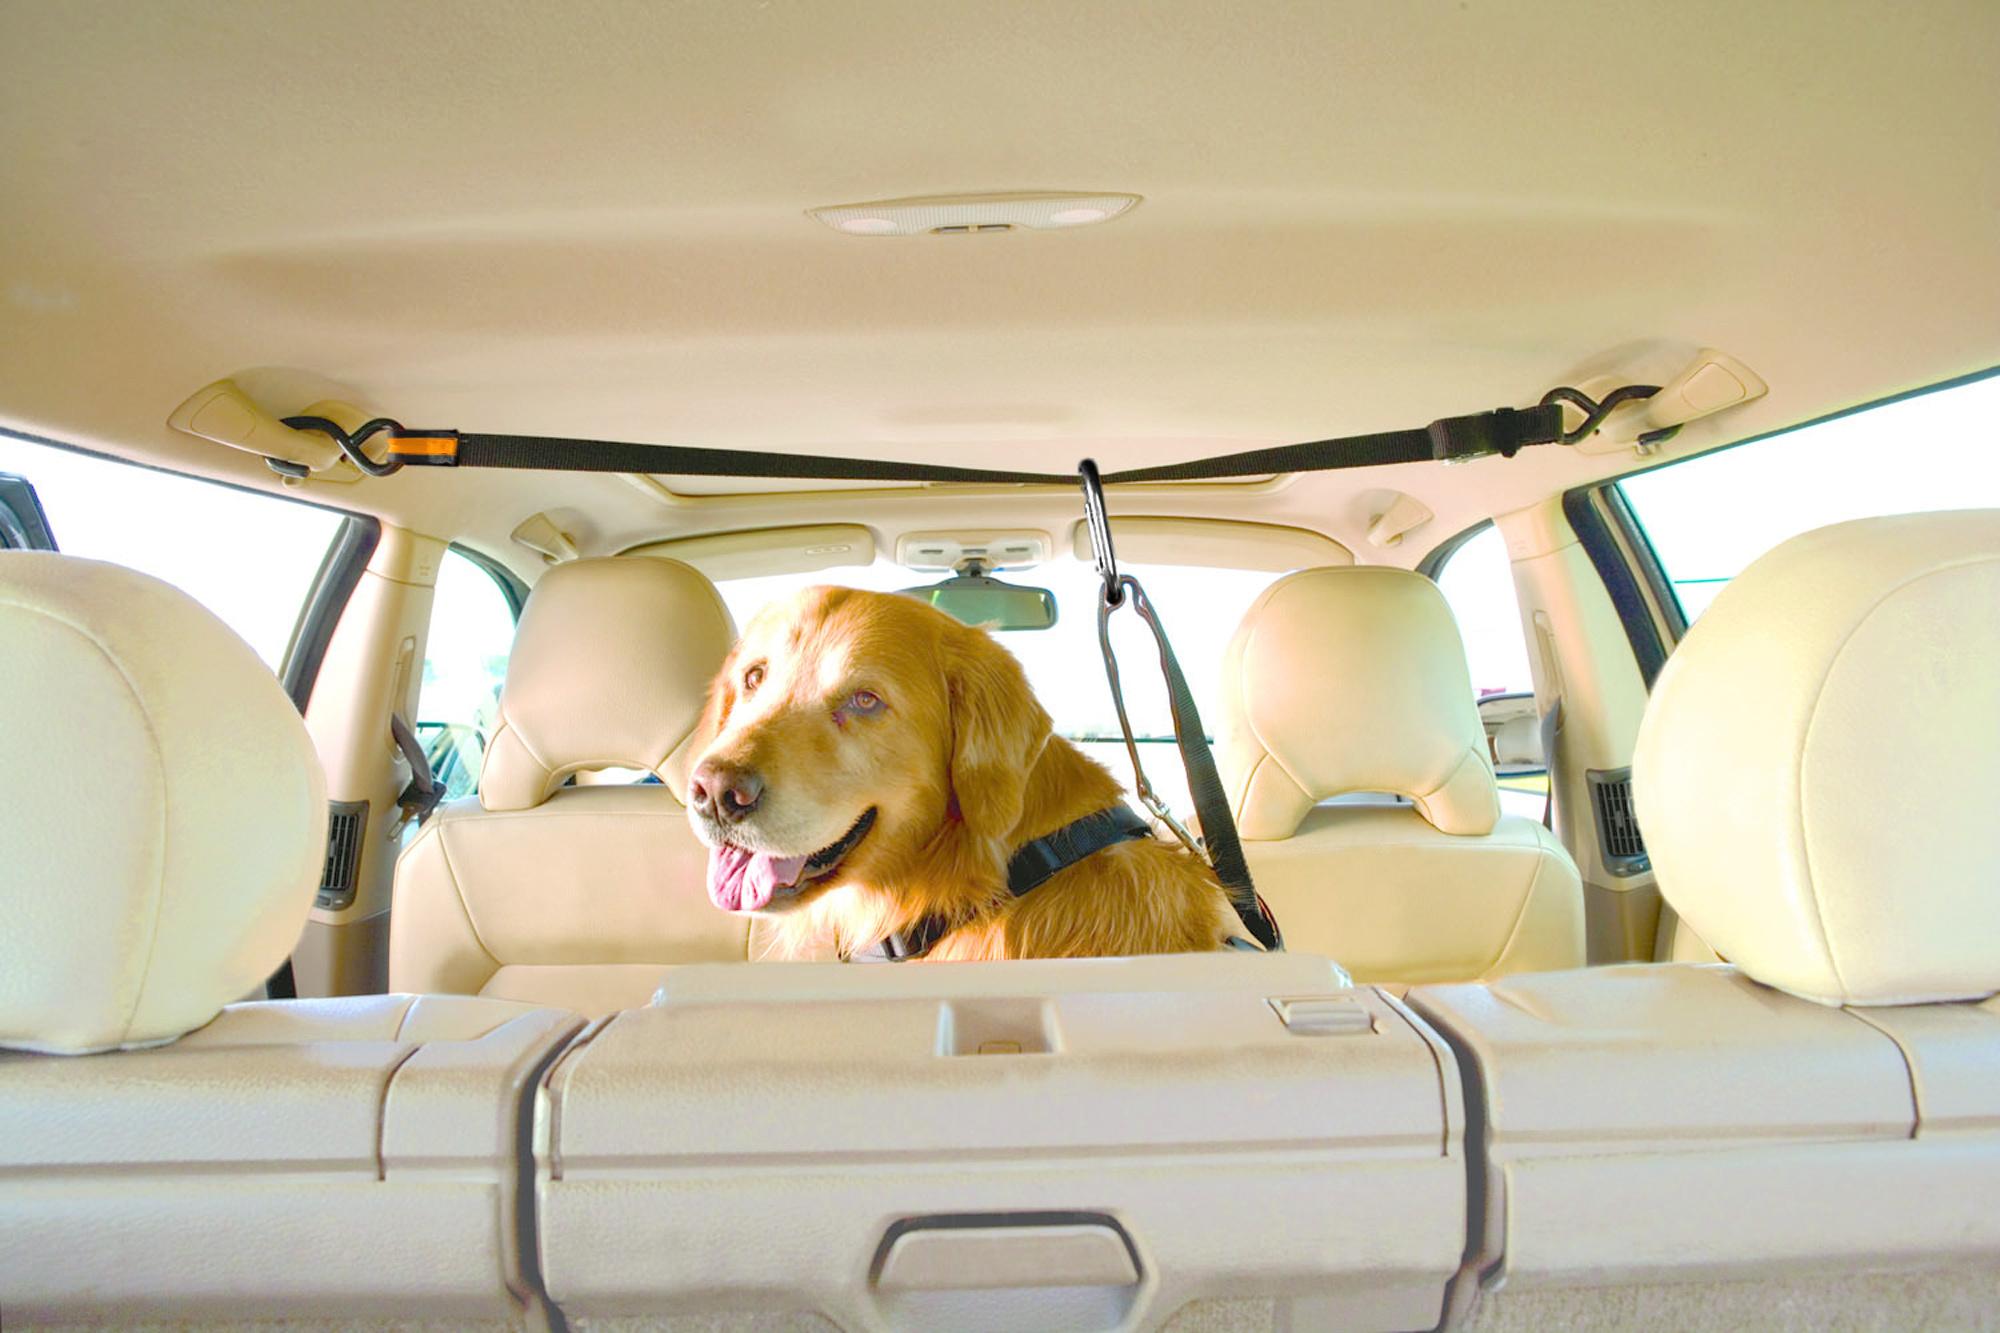 Pleasing Kurgo Kurgo Auto Zip Line For Dogs Unemploymentrelief Wooden Chair Designs For Living Room Unemploymentrelieforg